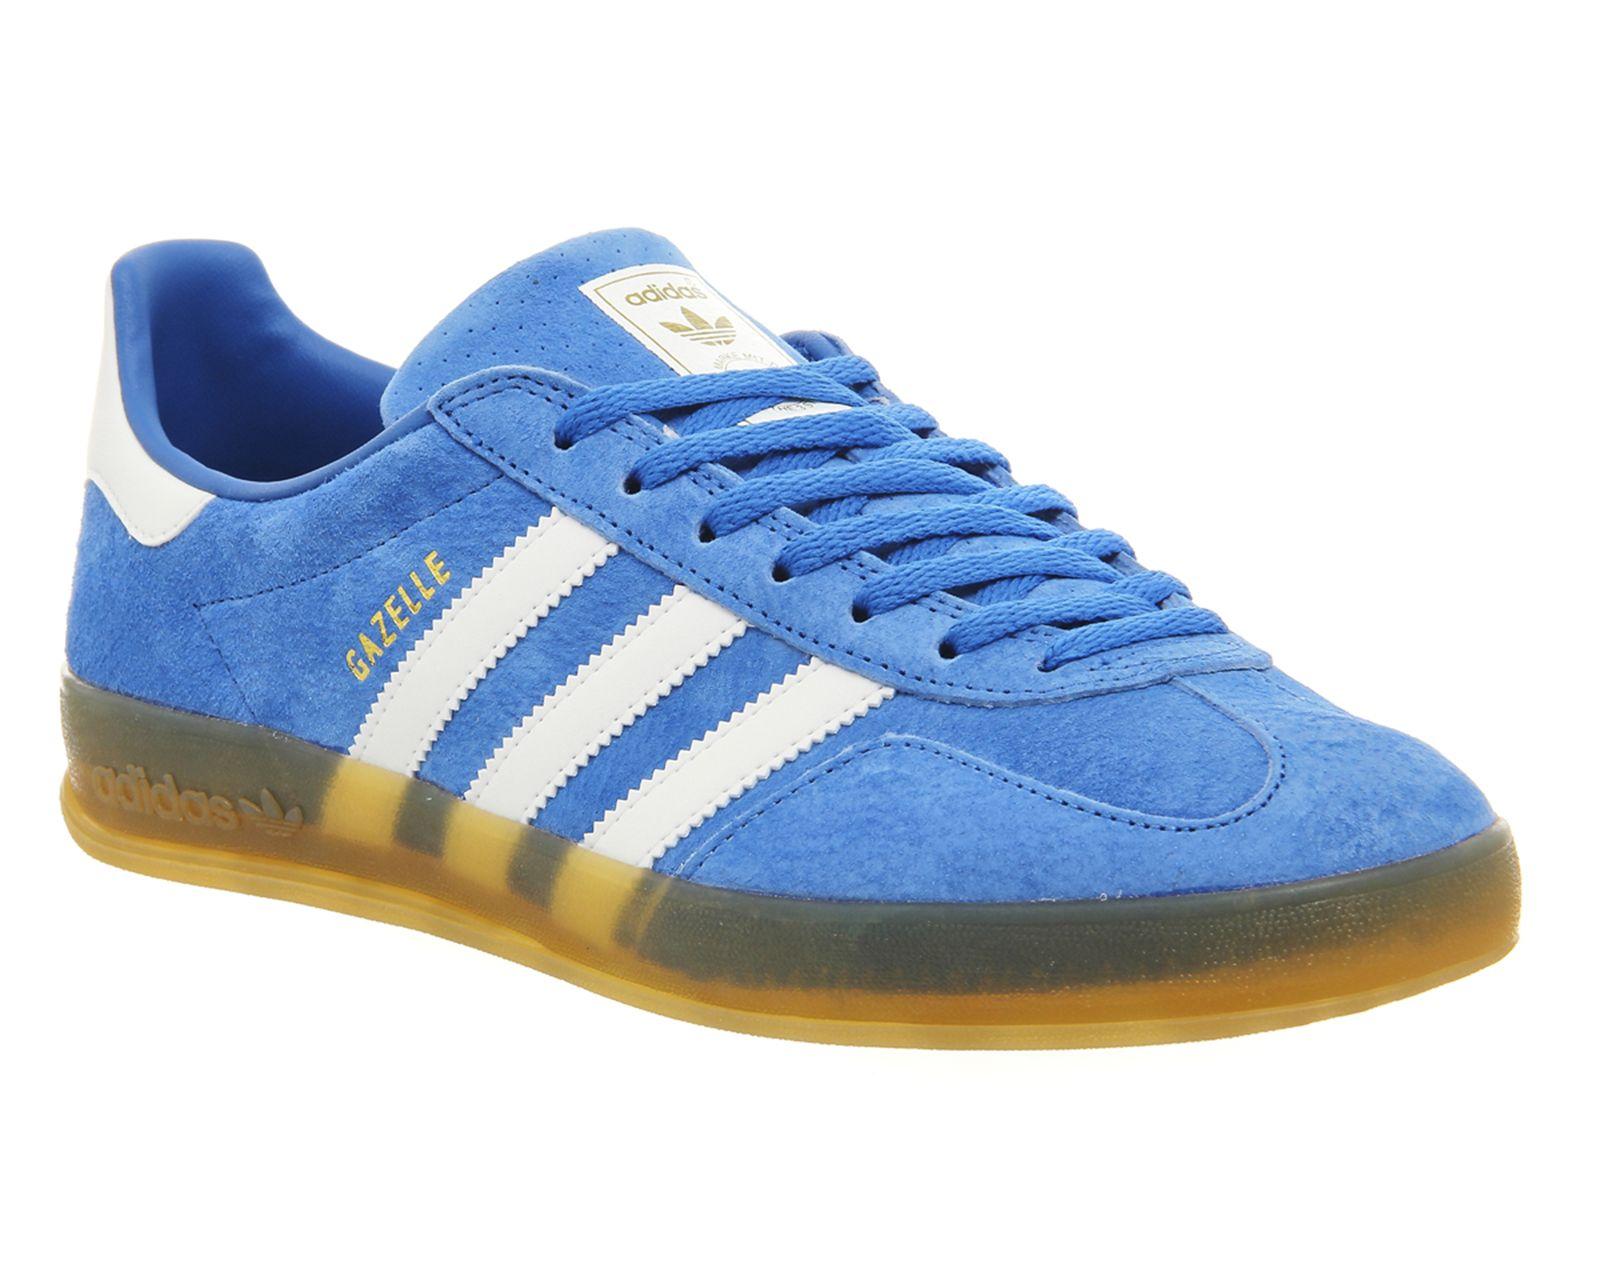 Gazelle Indoor | Adidas retro, Sneakers fashion, Adidas gazelle